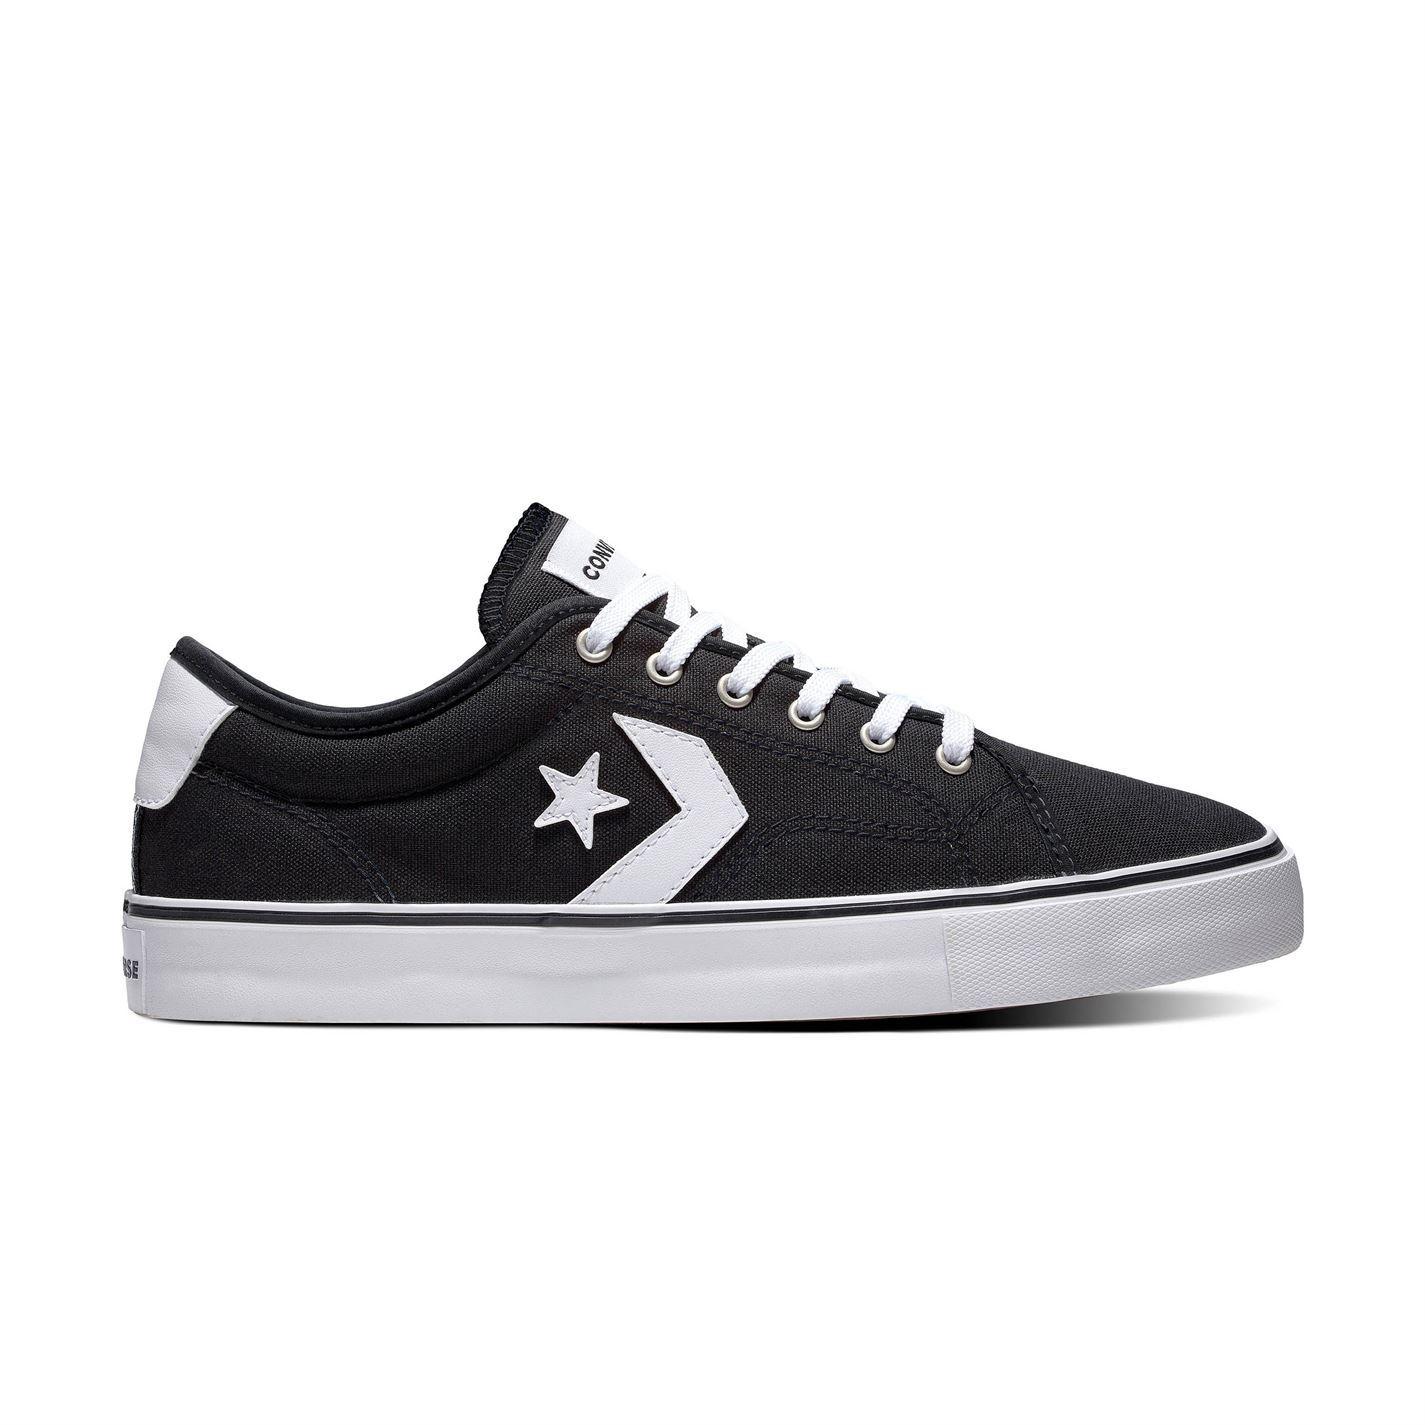 Converse-Ox-REPLAY-Baskets-Pour-Homme-Chaussures-De-Loisirs-Chaussures-Baskets miniature 5